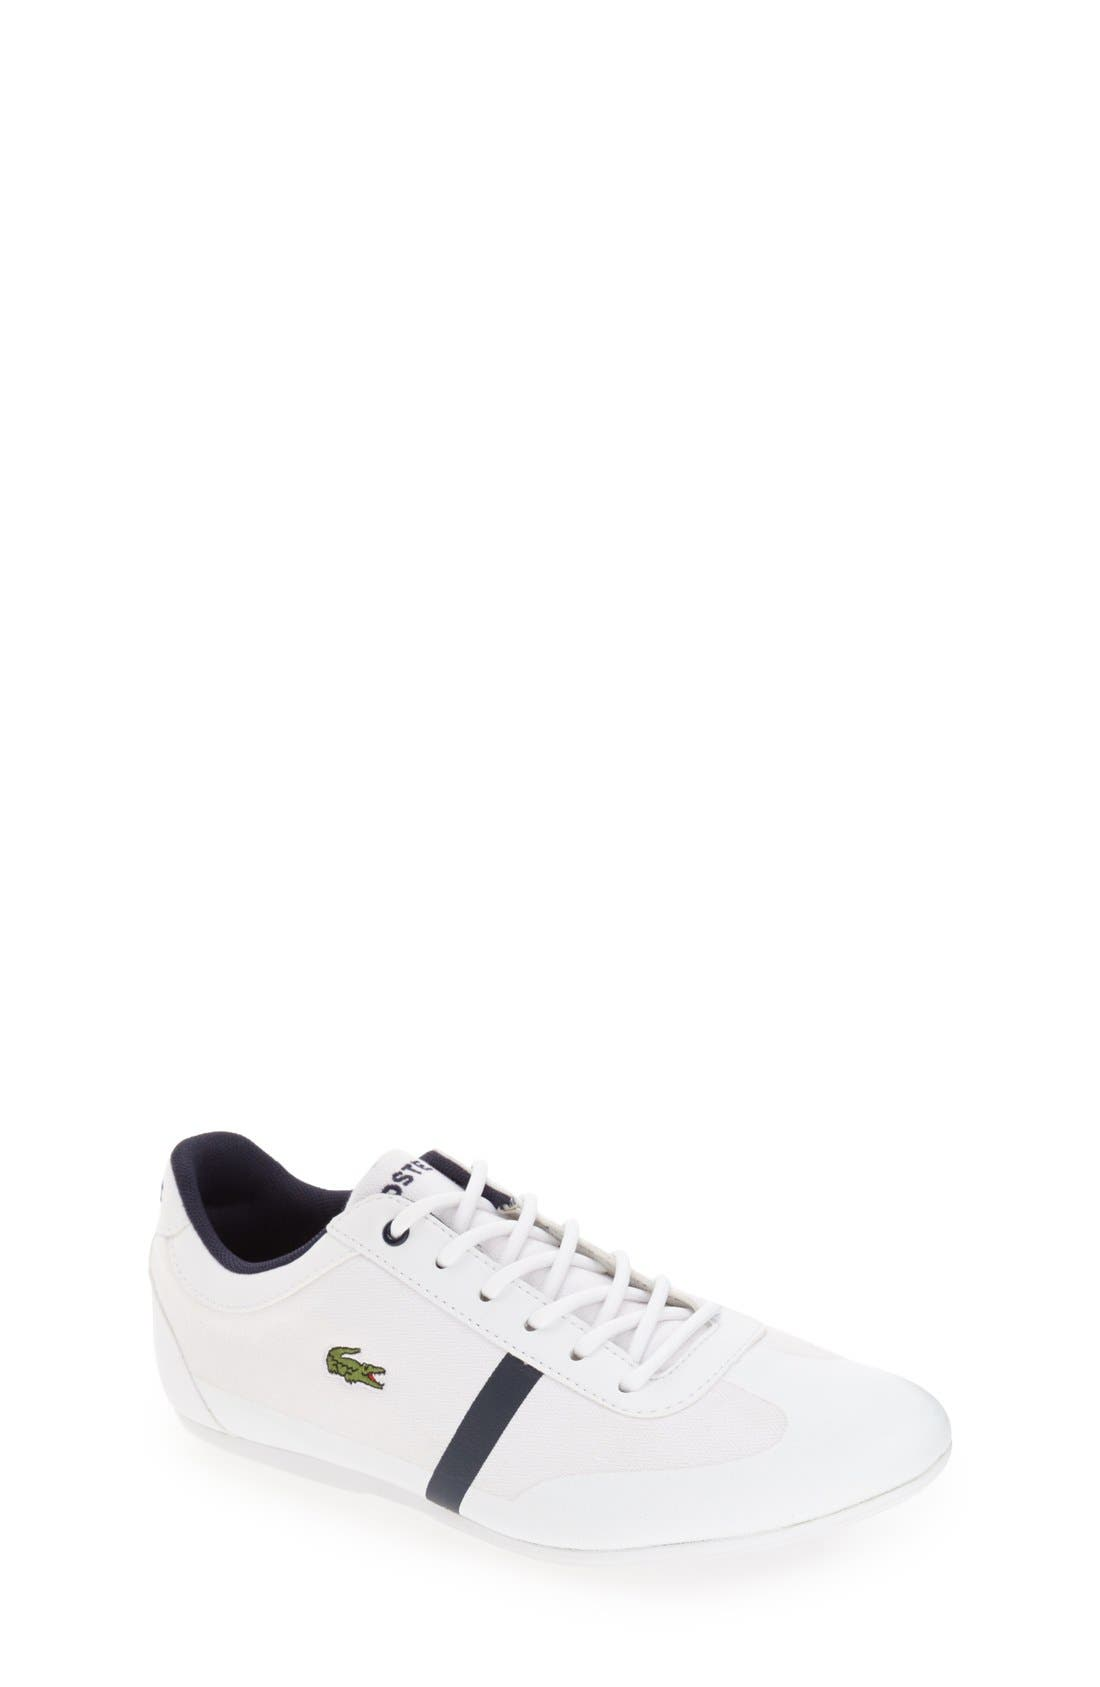 'Misano' Sport Sneaker,                             Main thumbnail 1, color,                             White